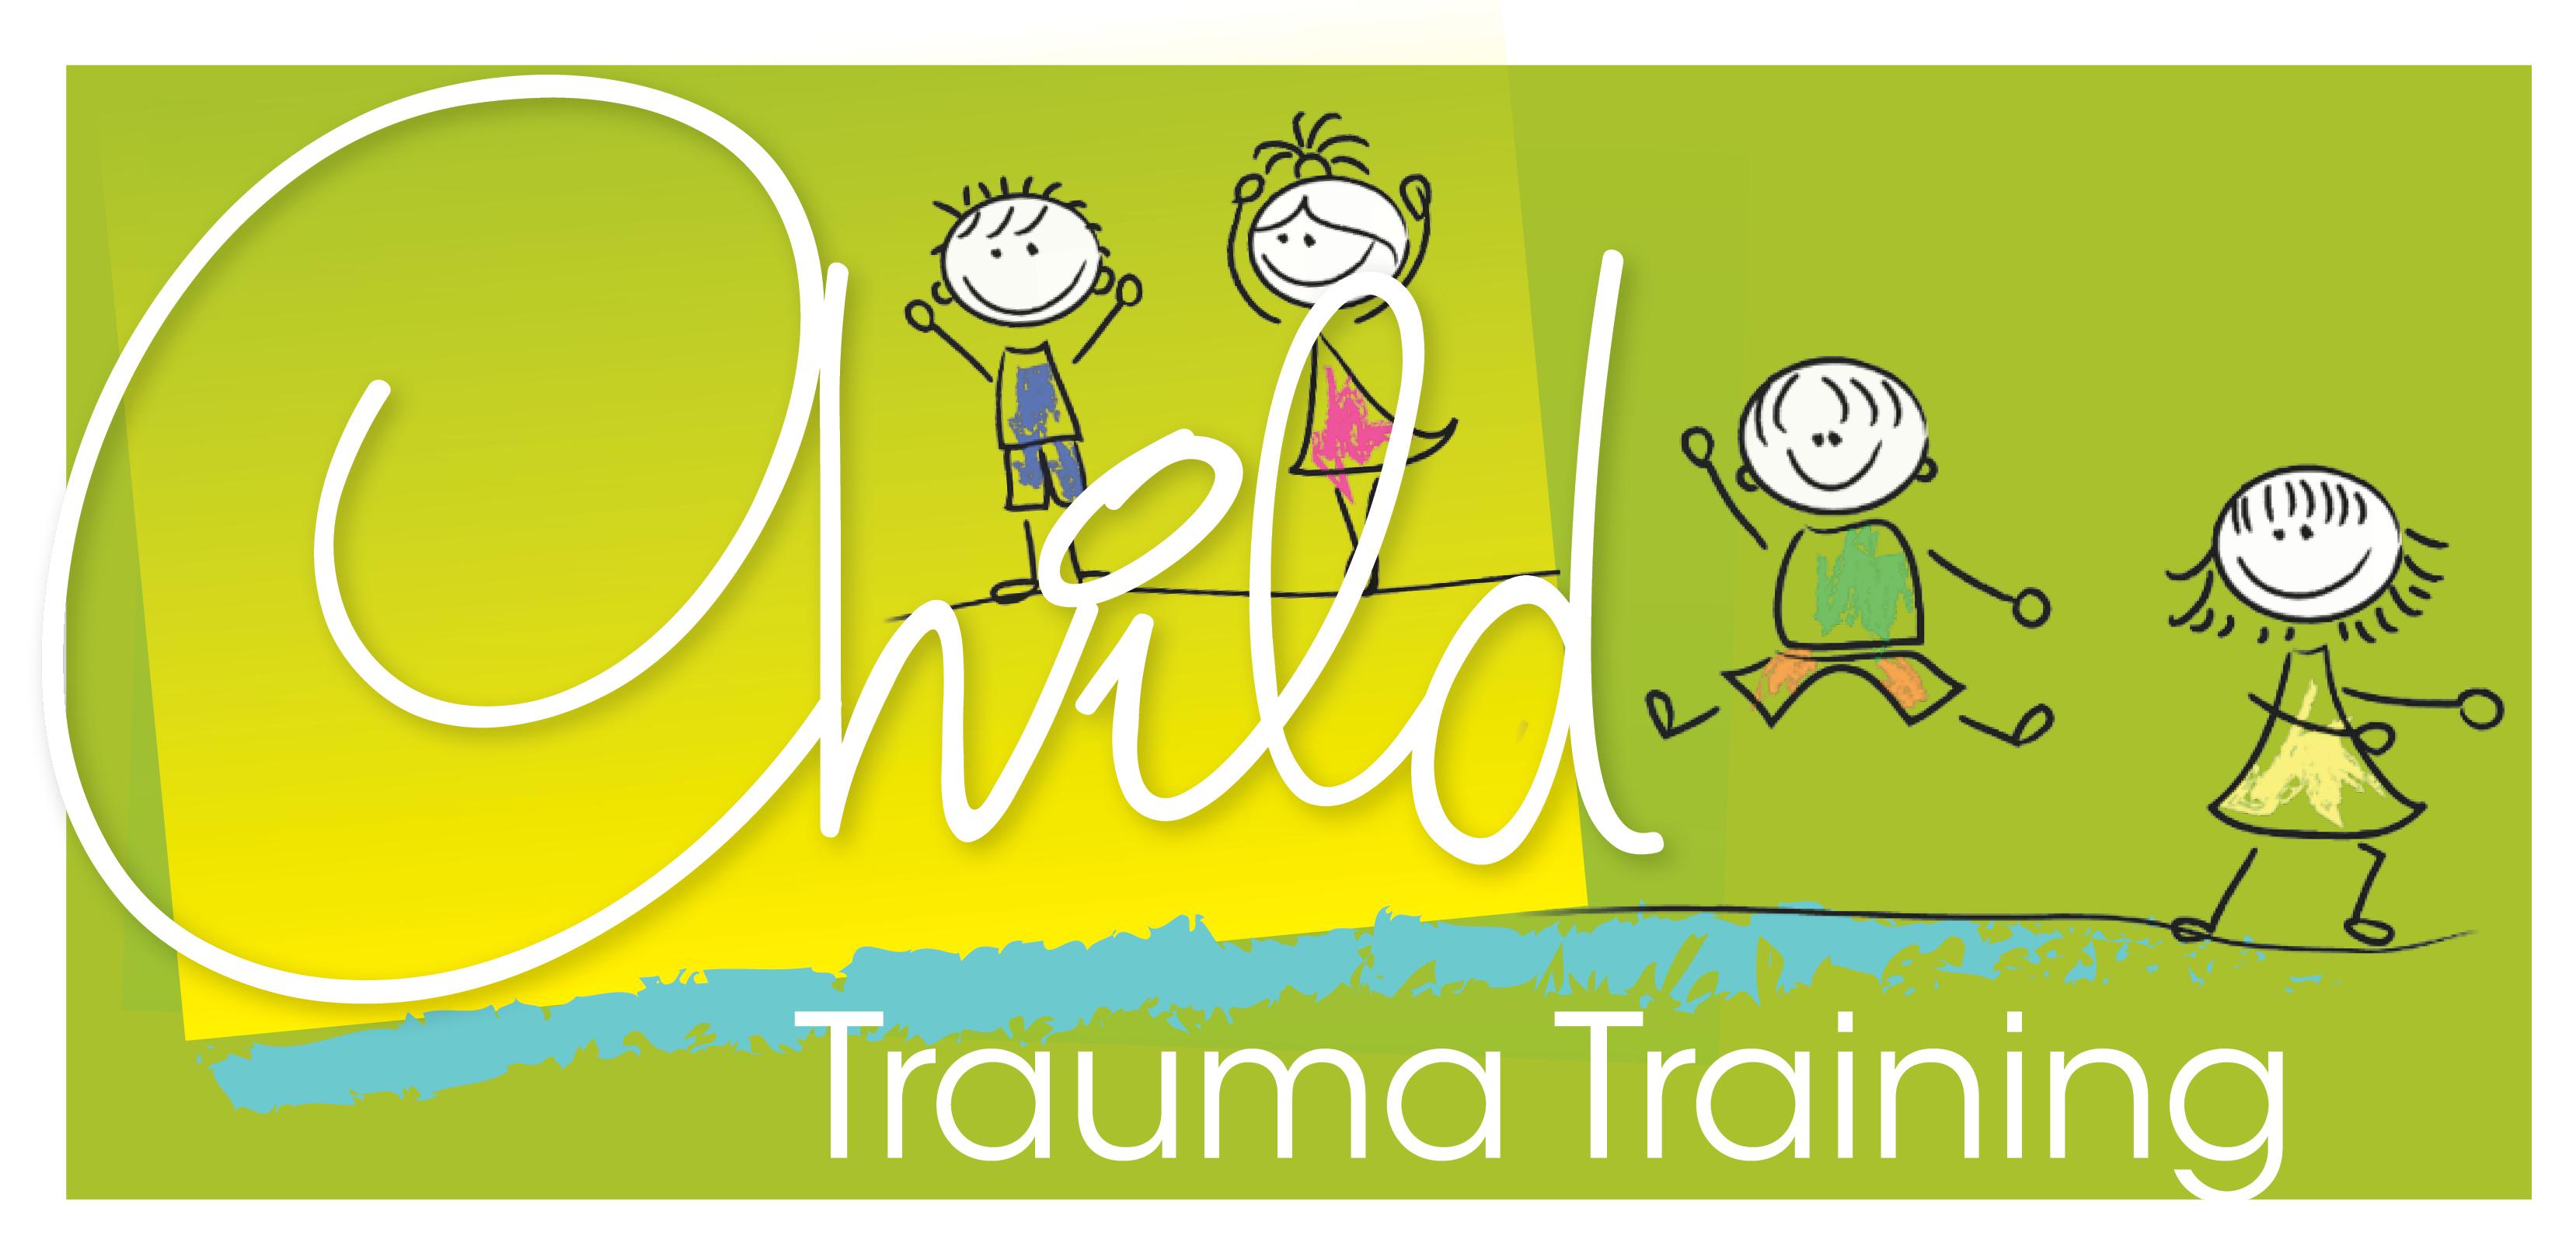 Child Trauma Training Logo